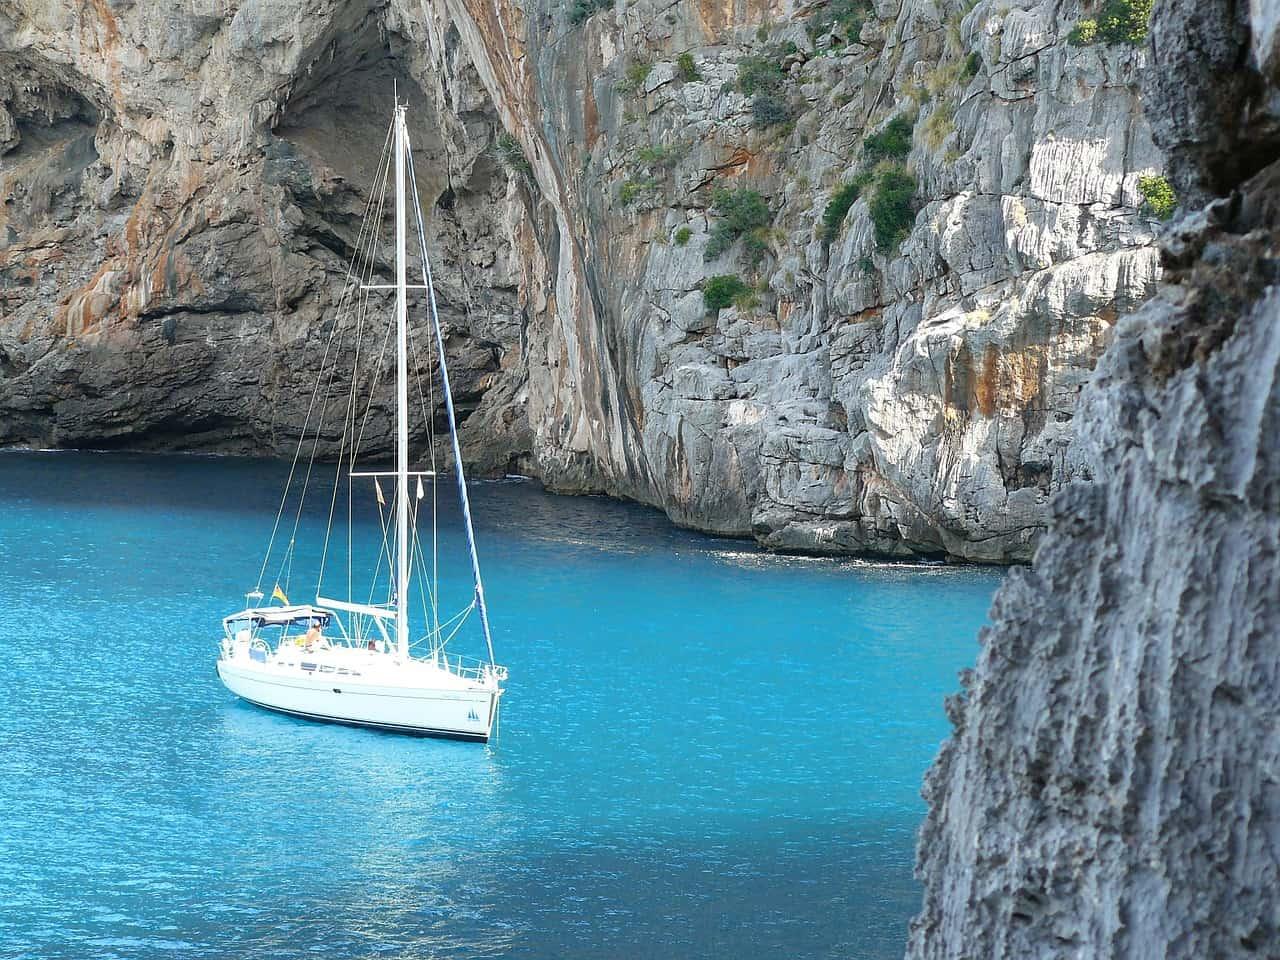 Mallorca Urlaub 2019 - All Inclusive nur 330,00€ Balearen